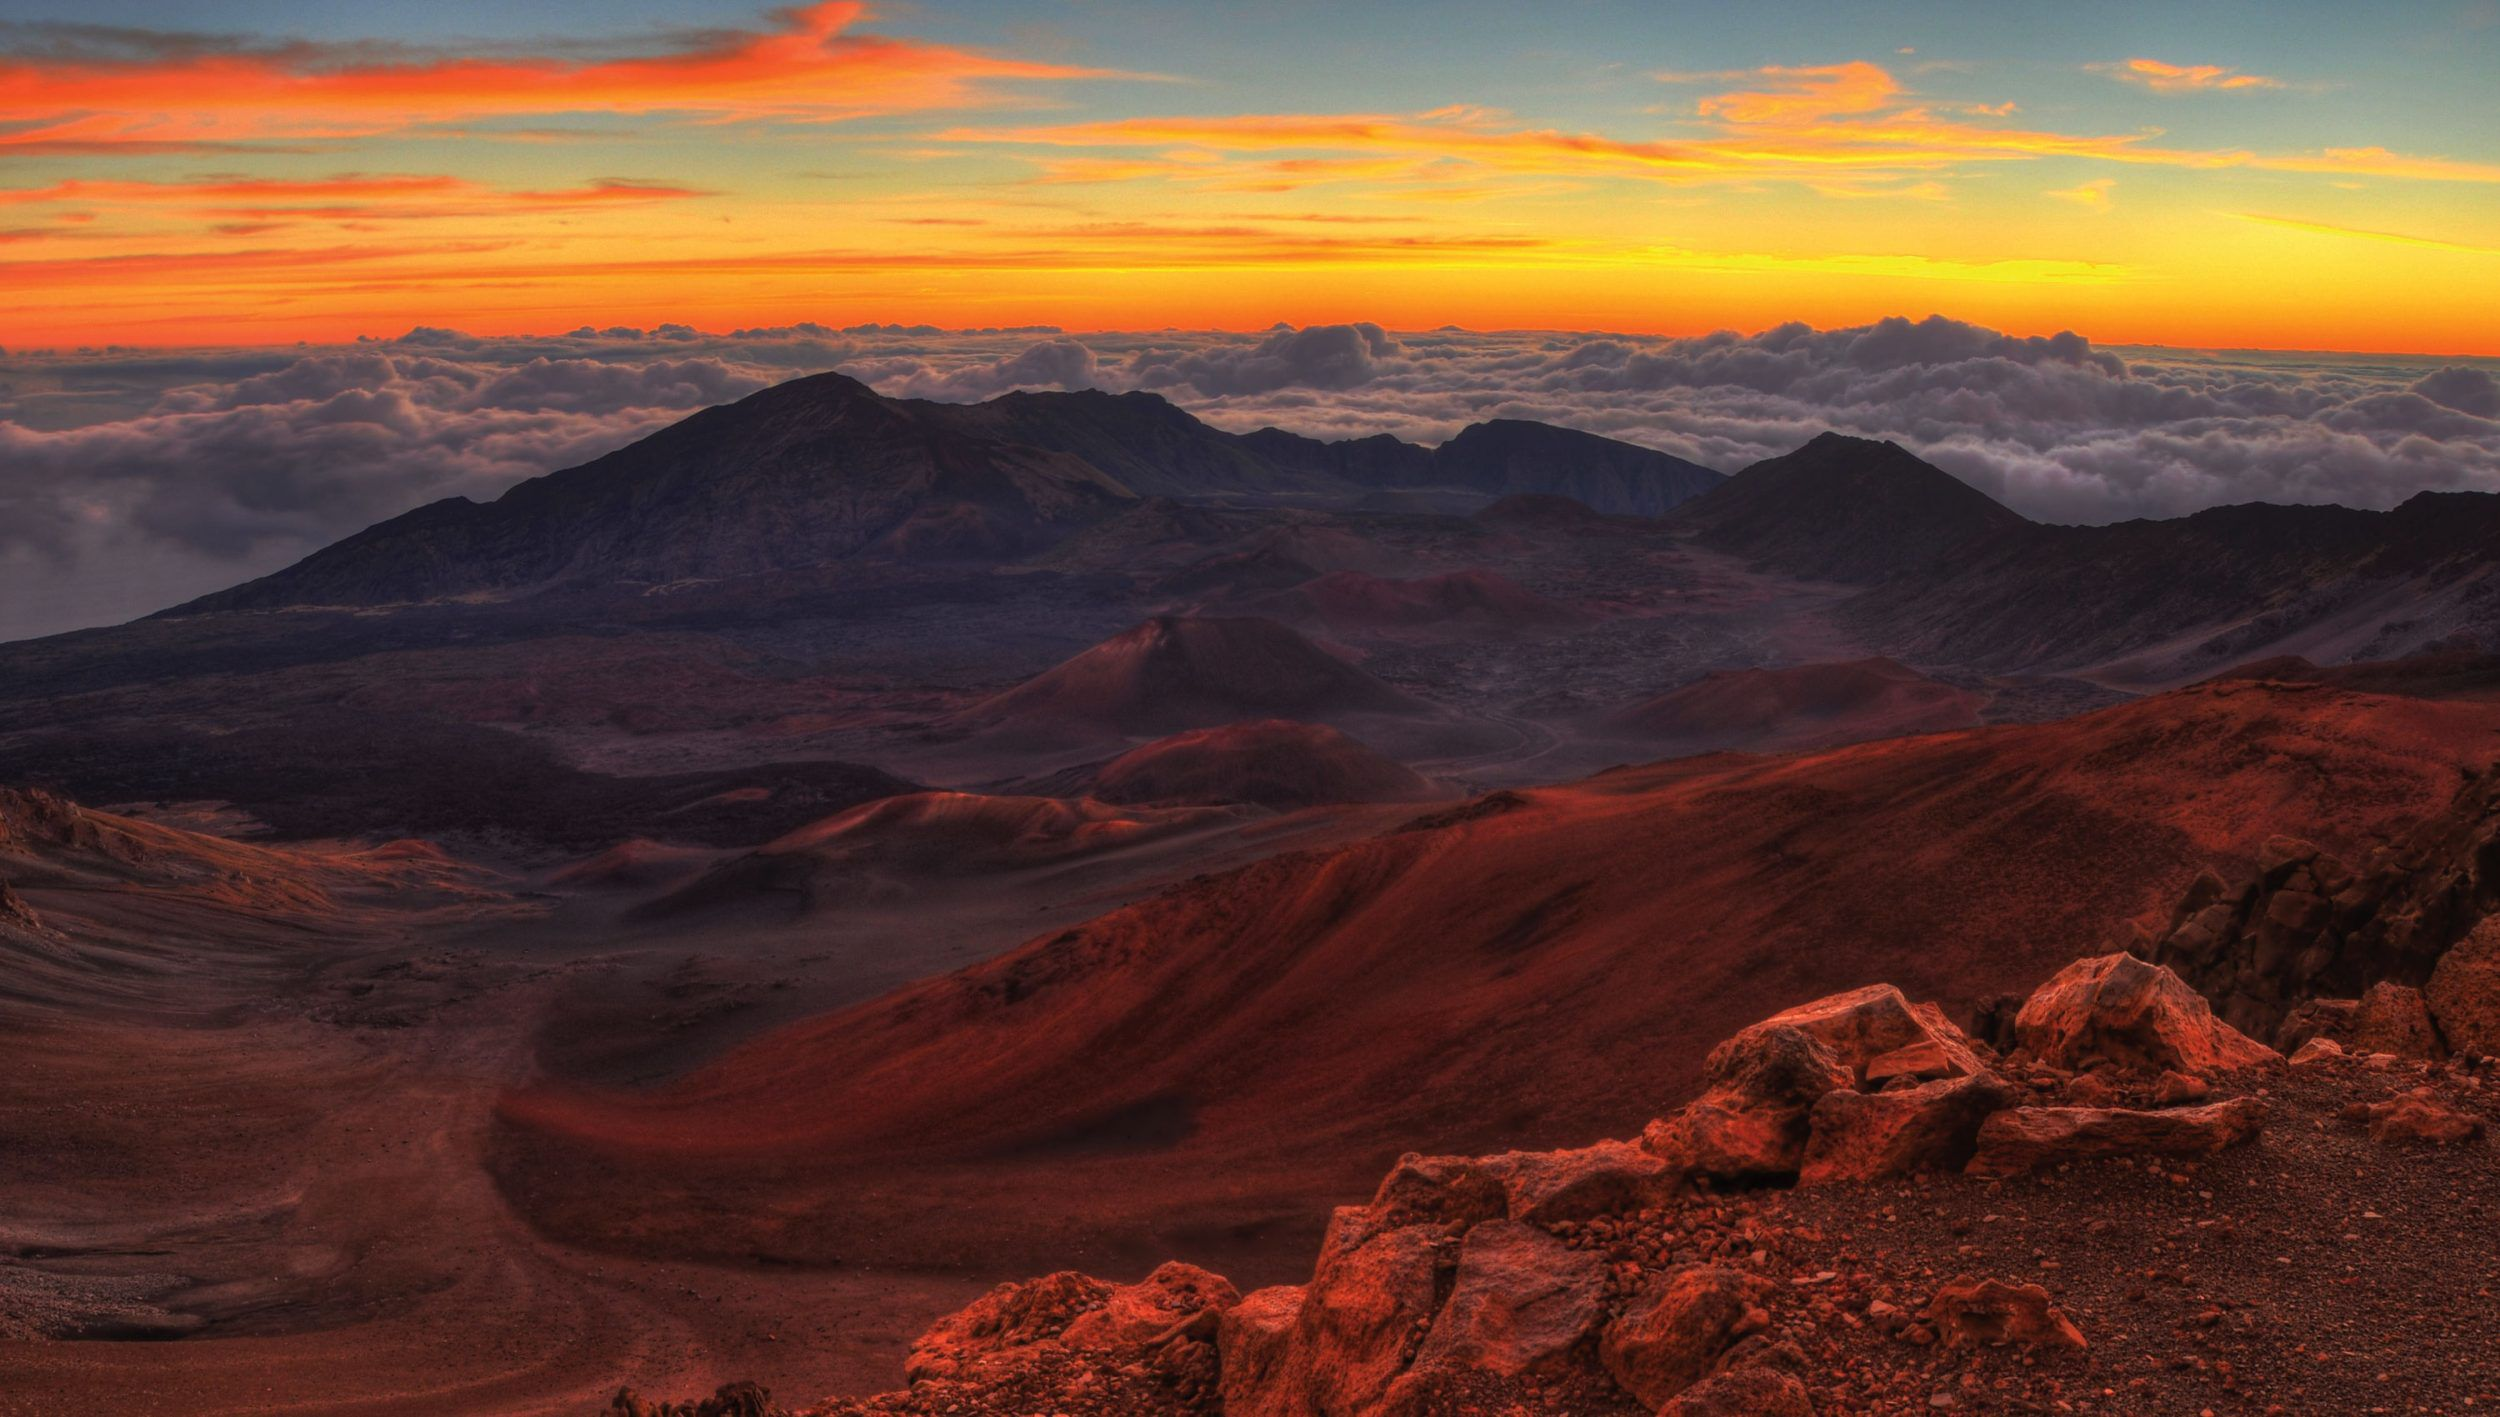 The Kingdom of Lesotho's Letšeng mine